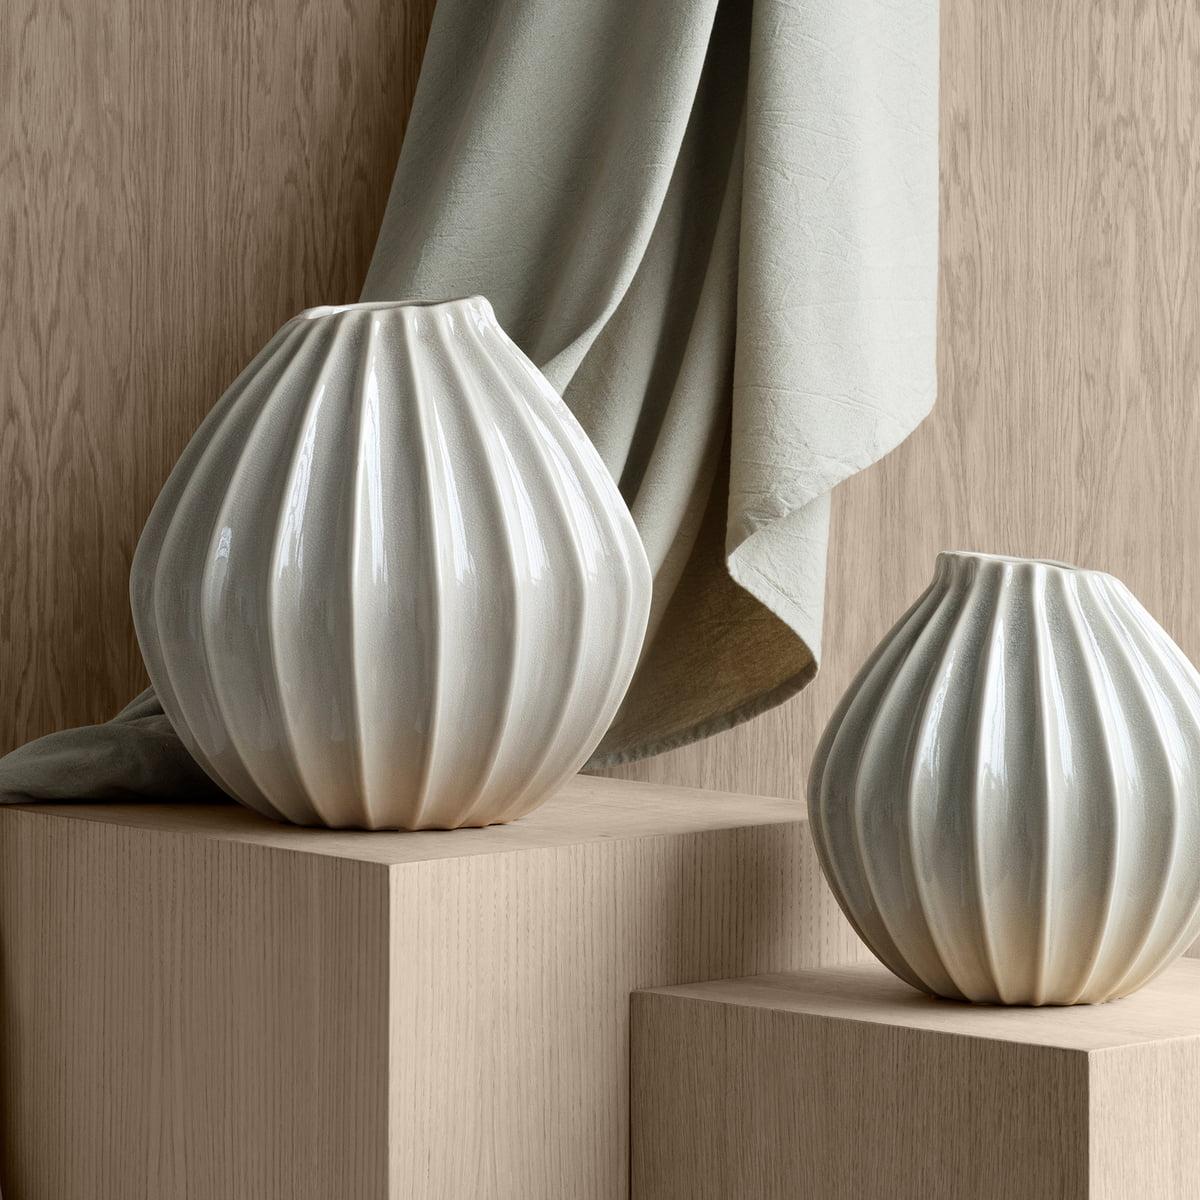 Broste Copenhagen   Wide Vase, Ø 20 x H 20 cm, smoked pearl